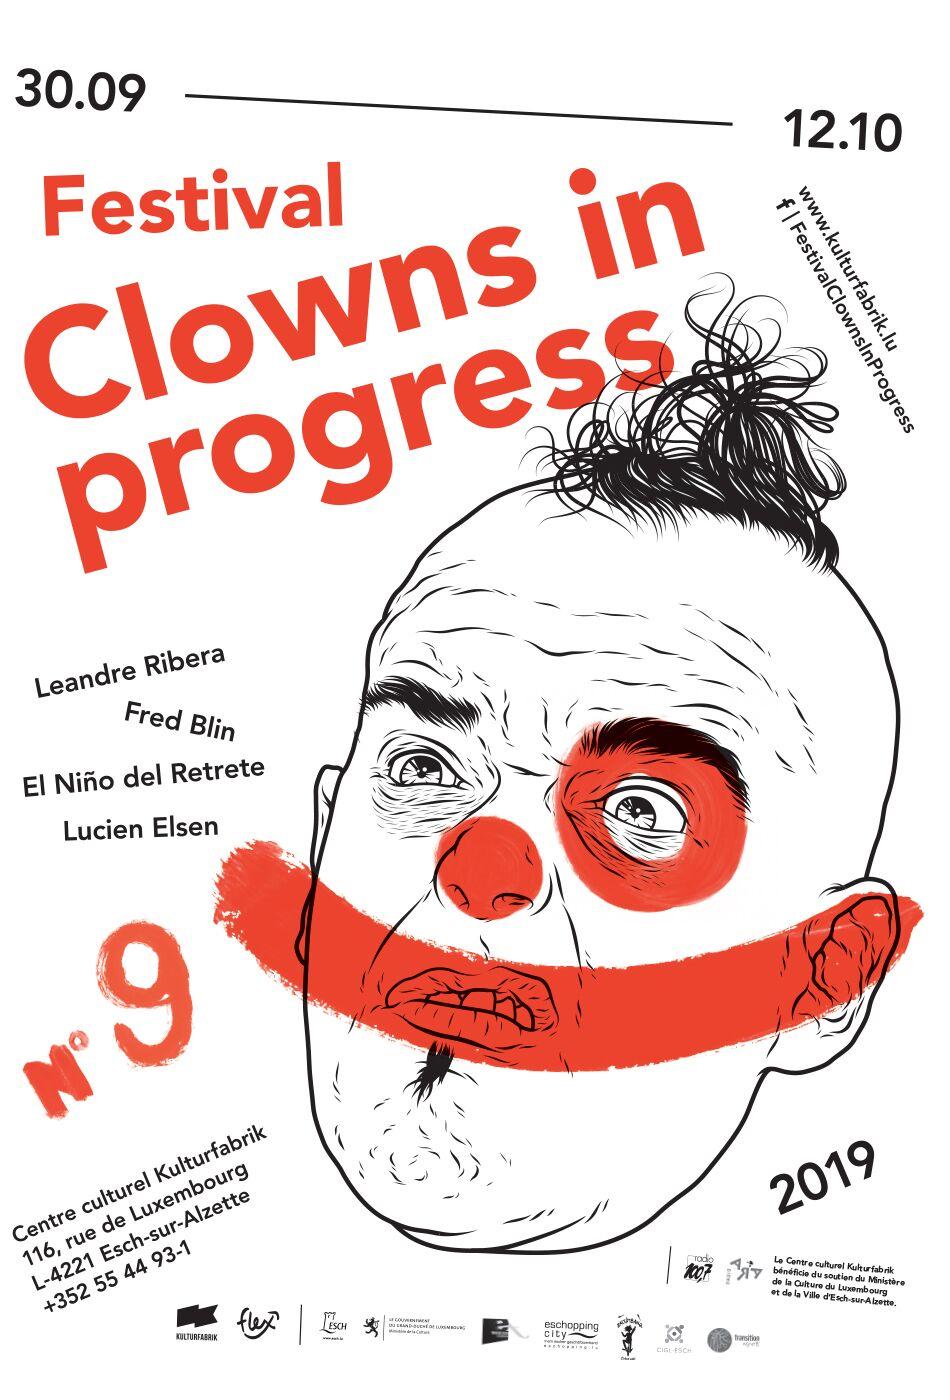 Festival_Clowns in progress_Kulturfabrik_Esch sur Alzette_szenik